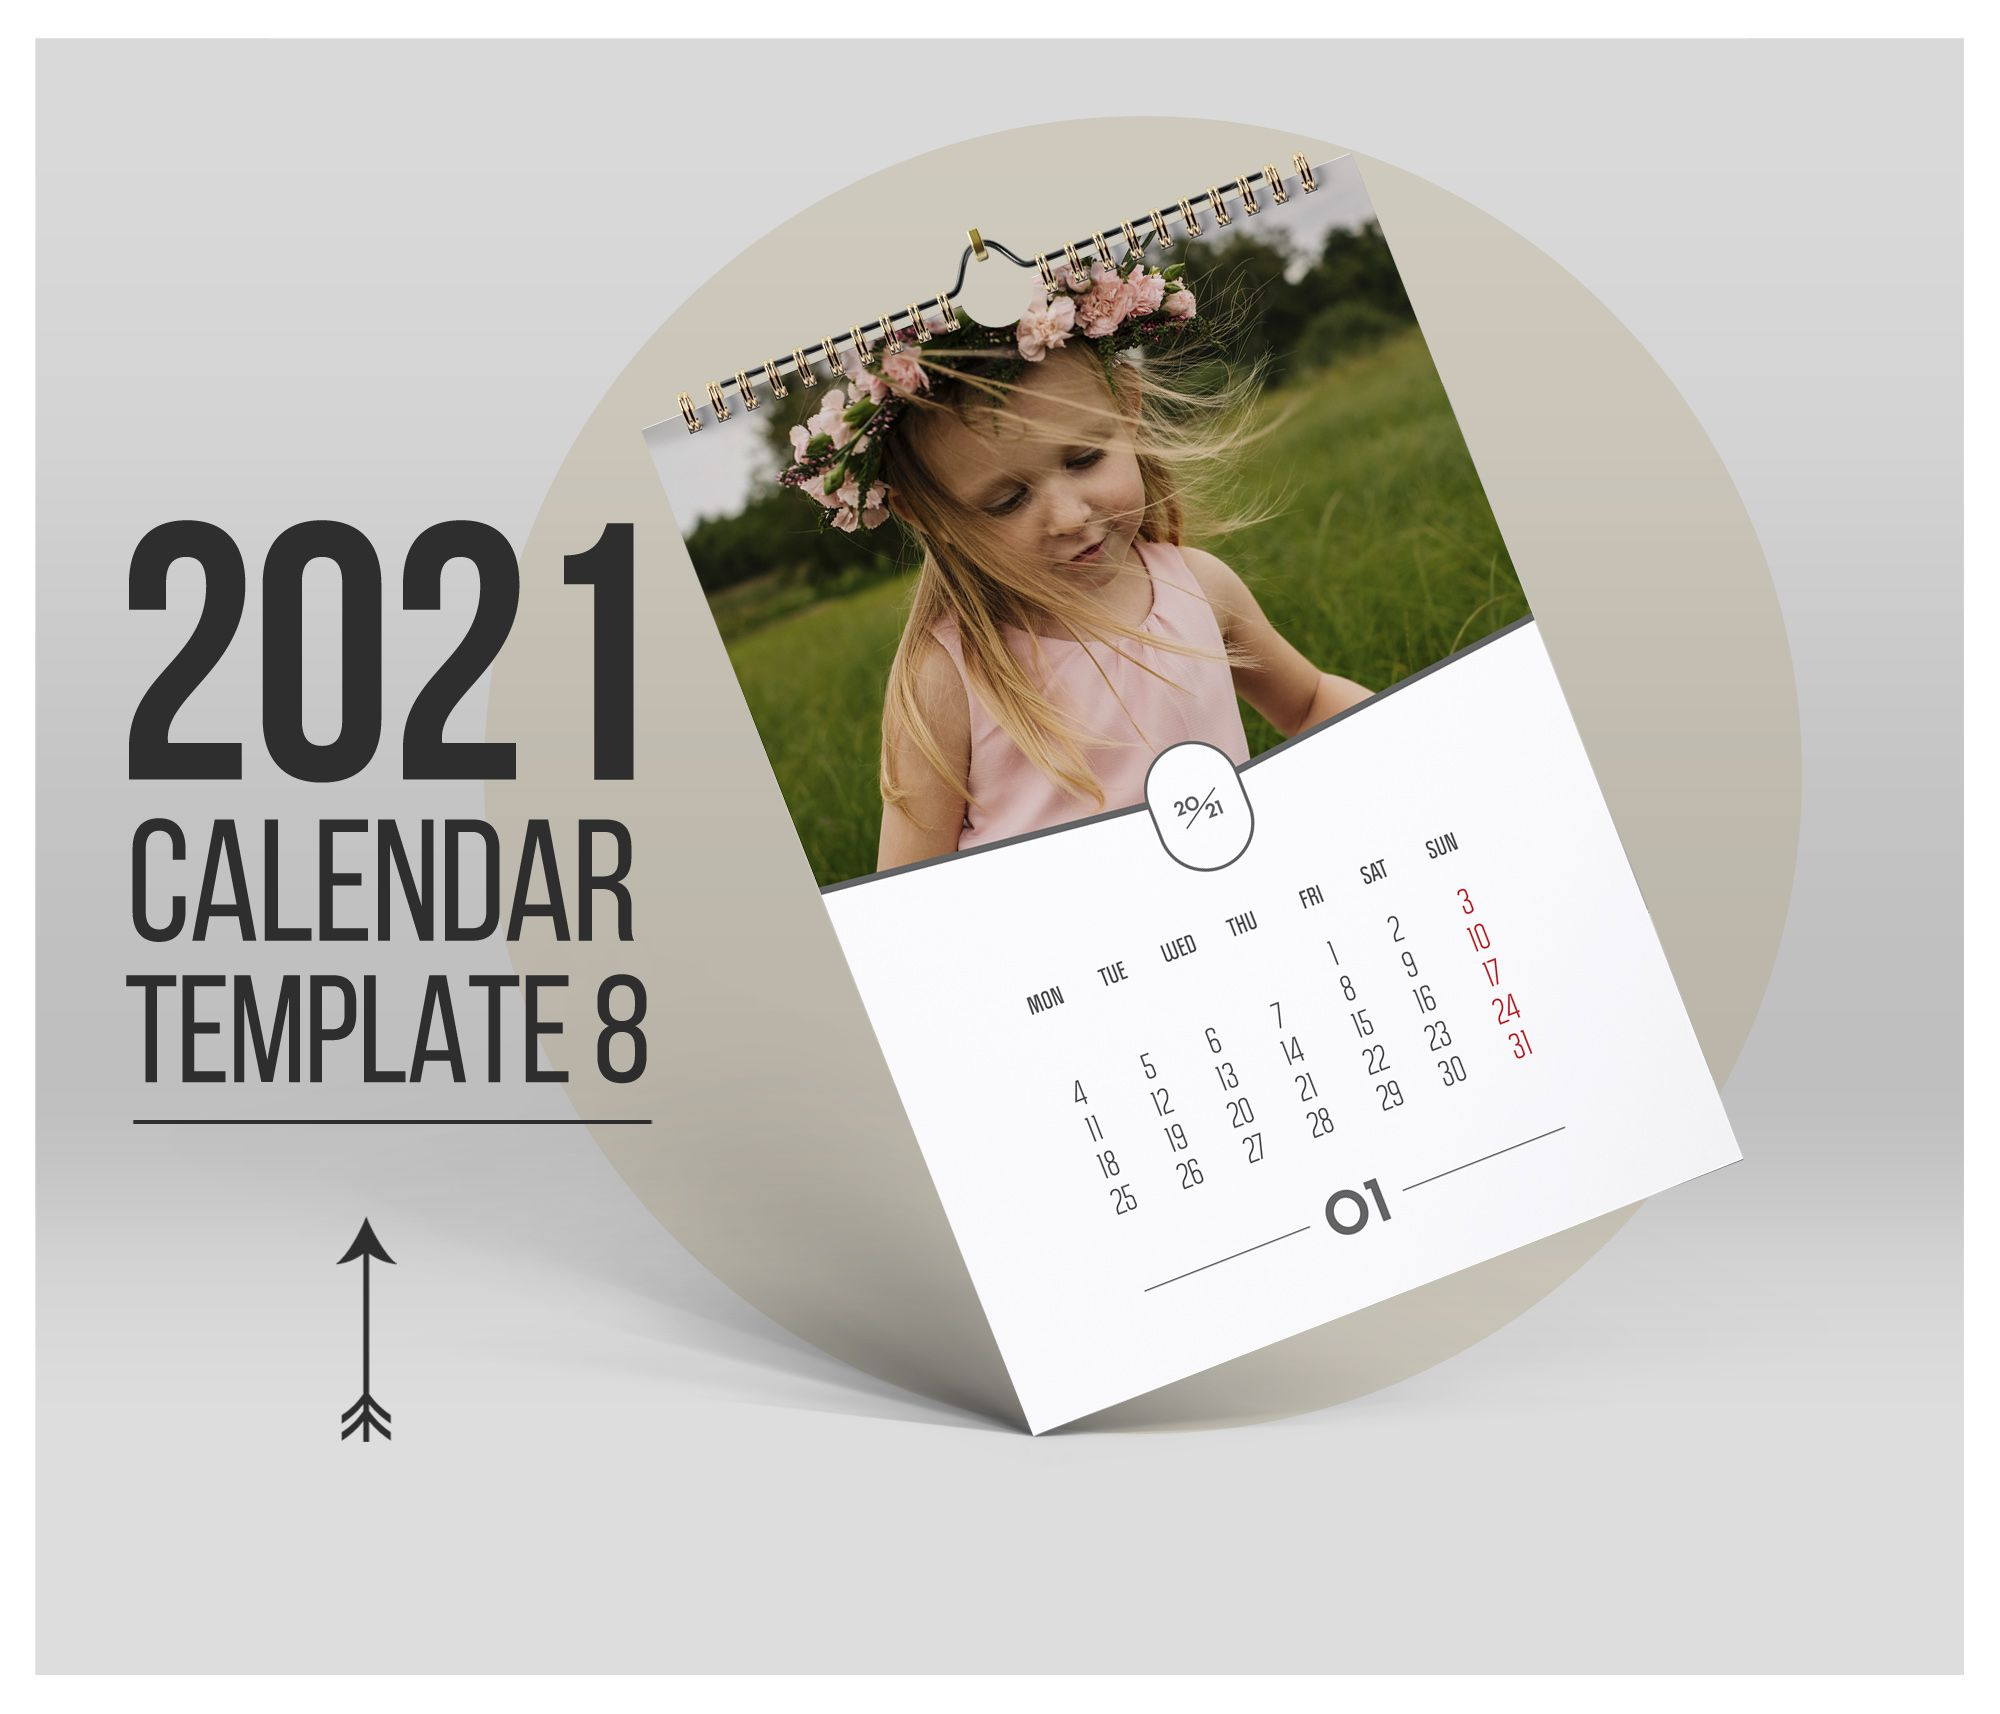 Pin on Celendar 2021 template